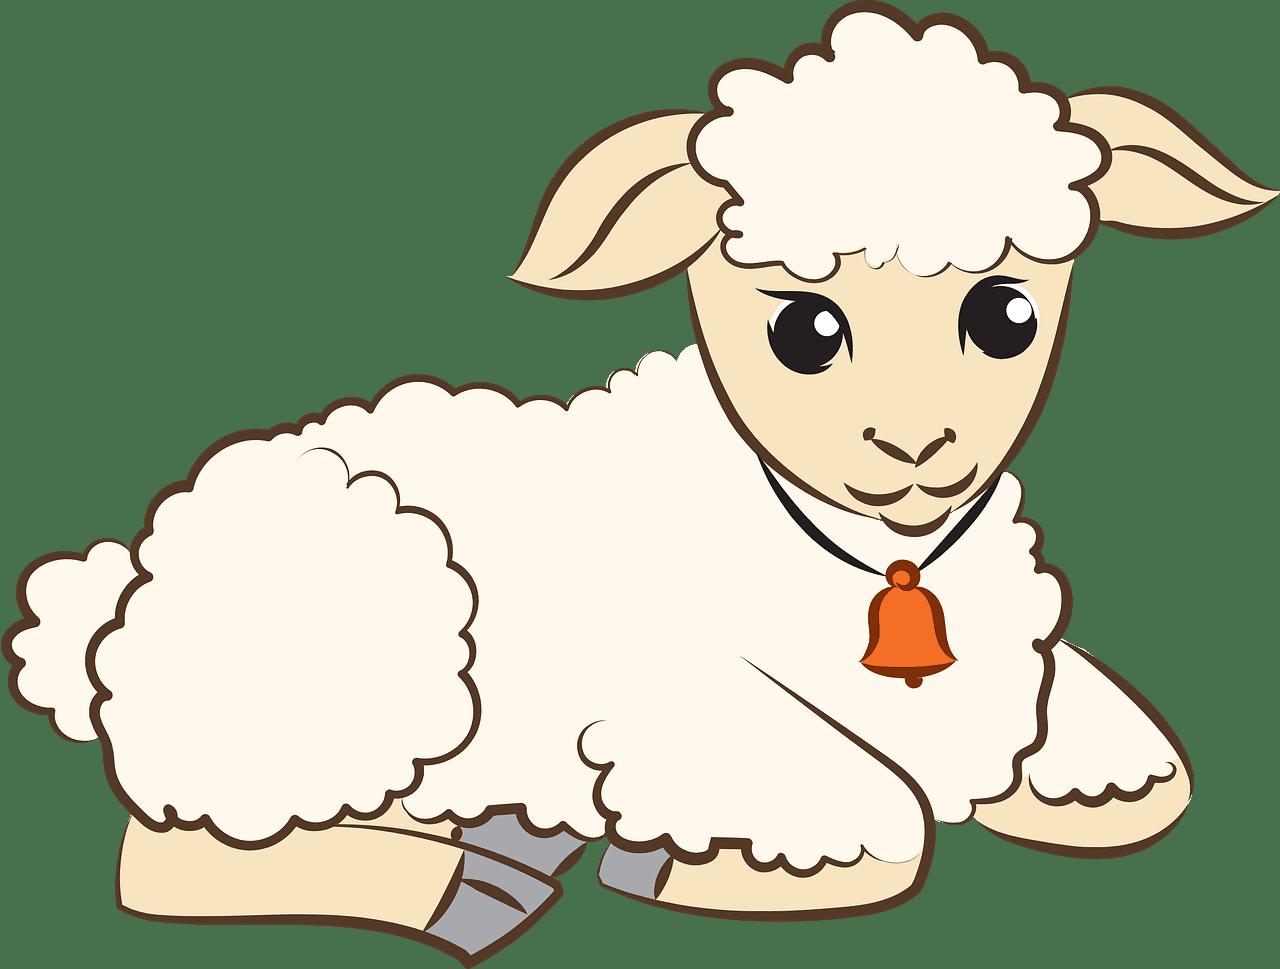 Lamb clipart transparent background